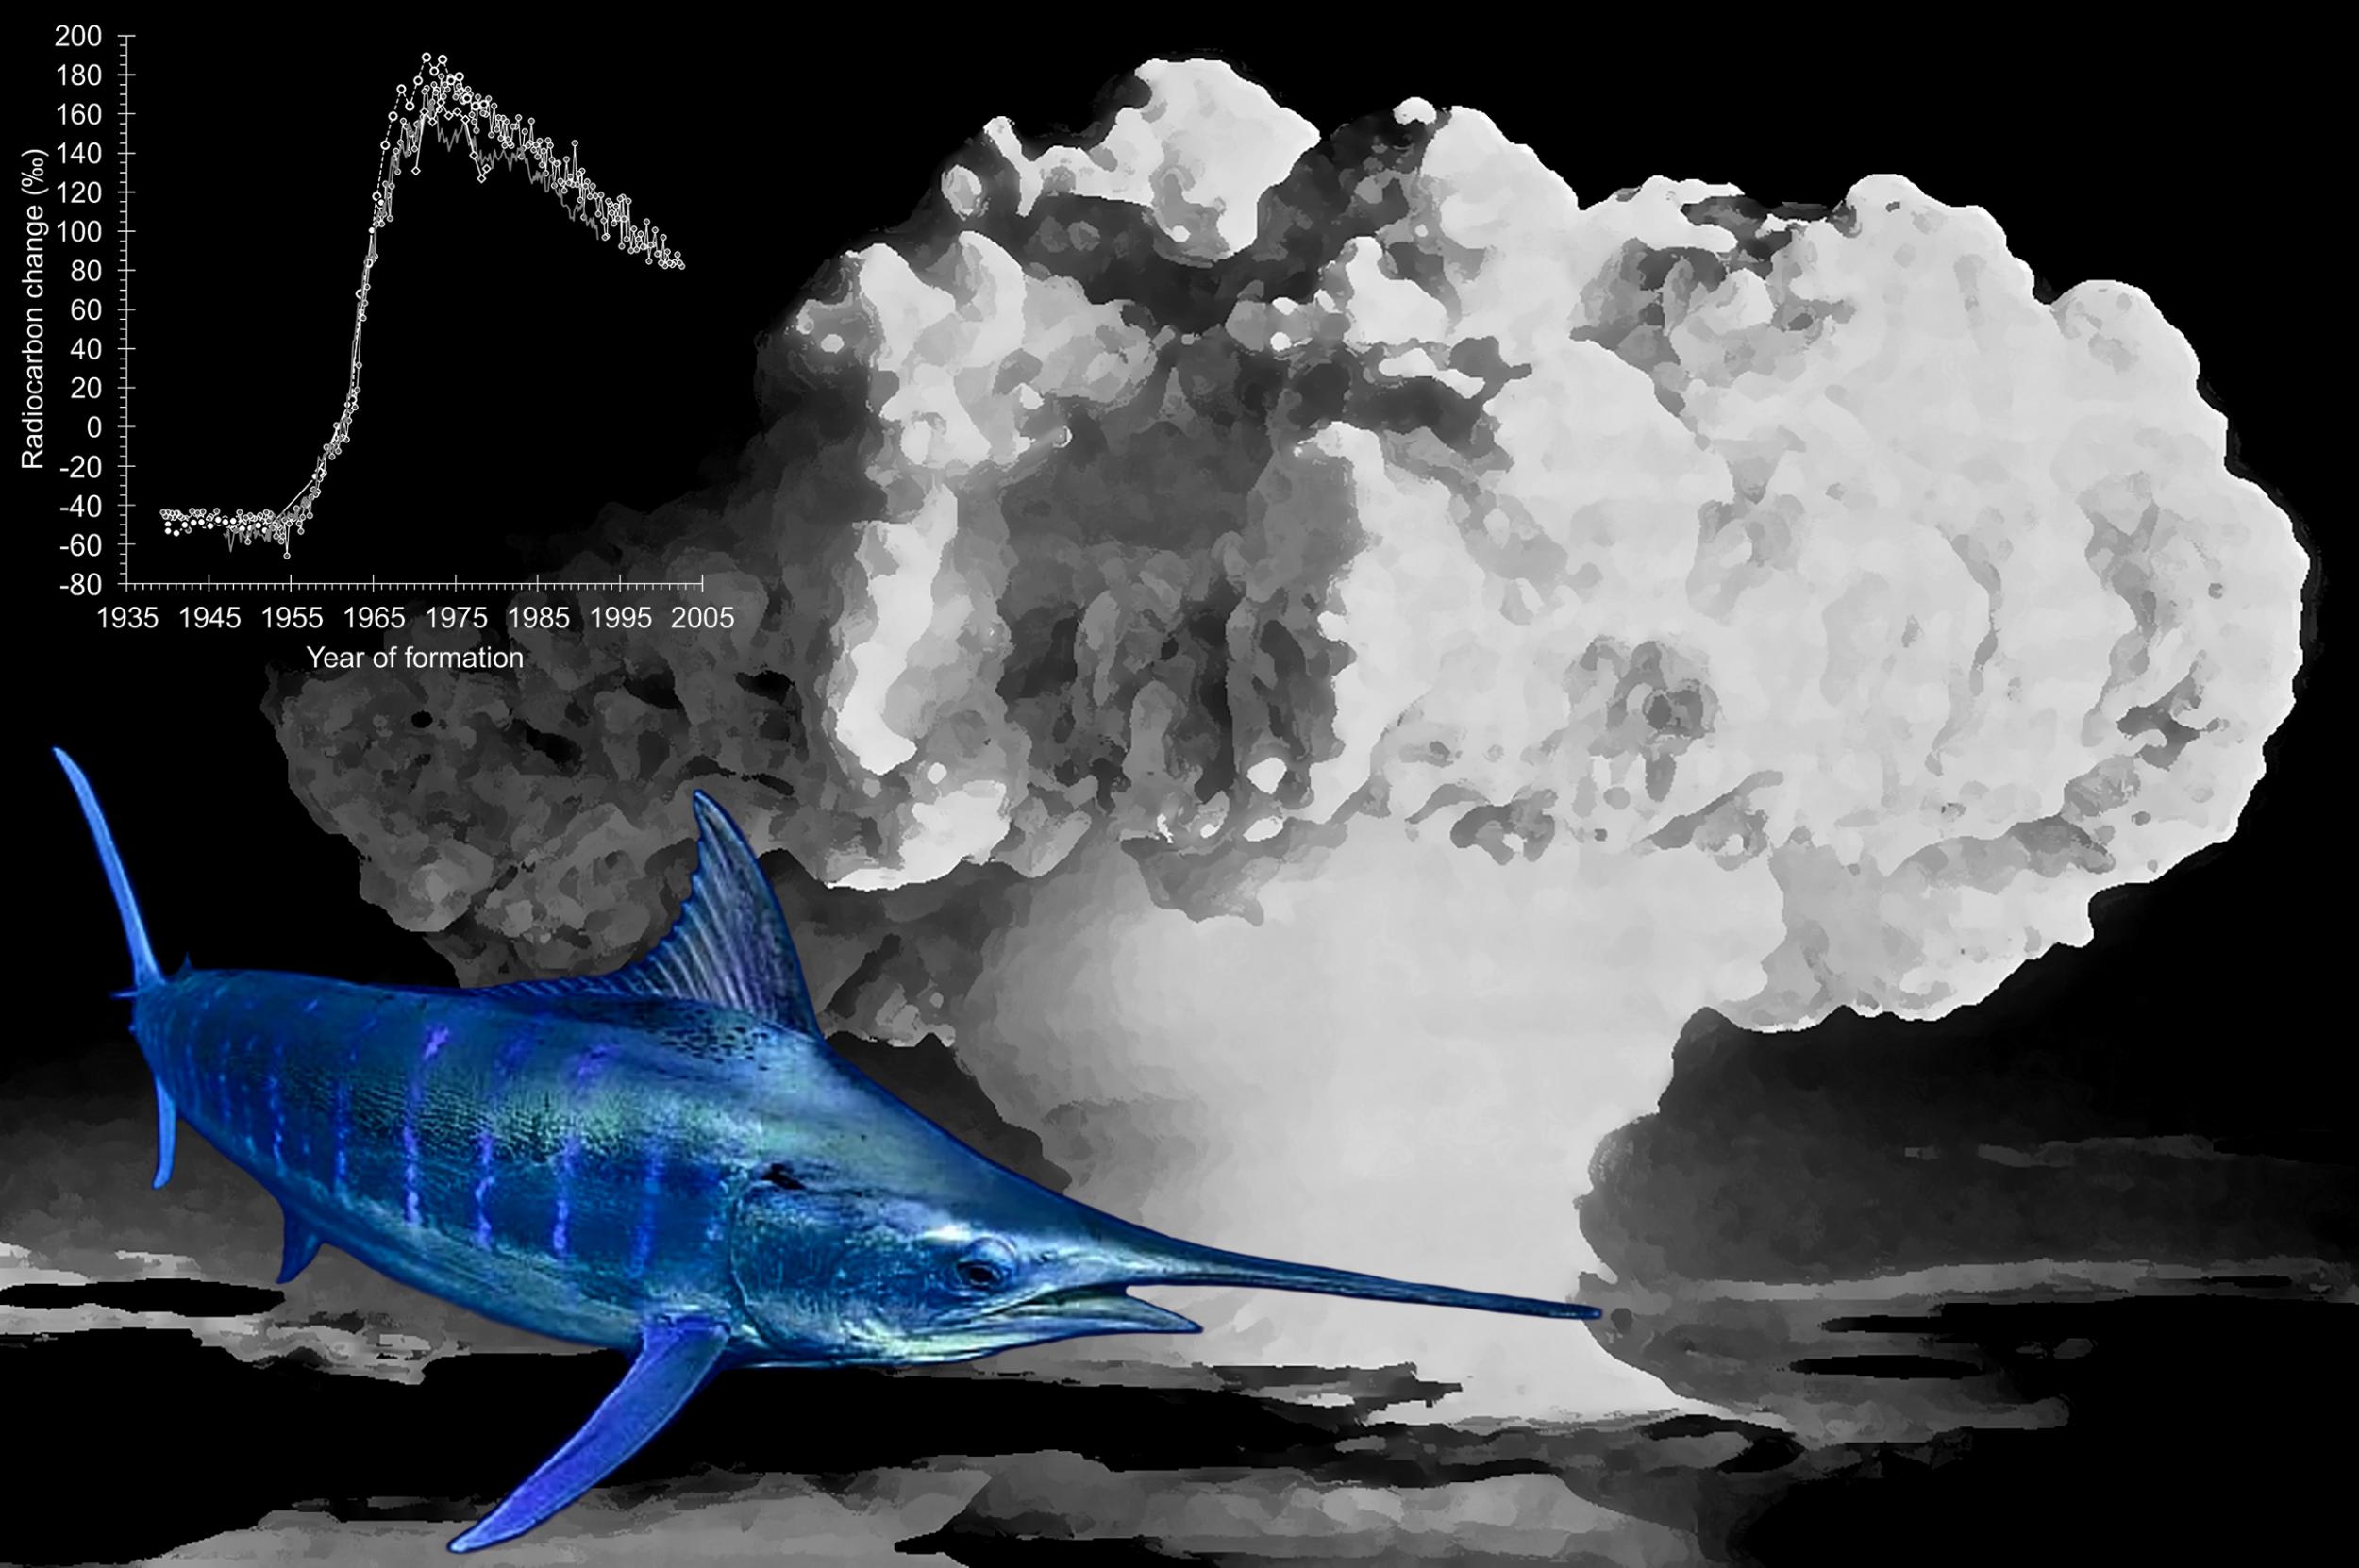 Marlin_Bomb